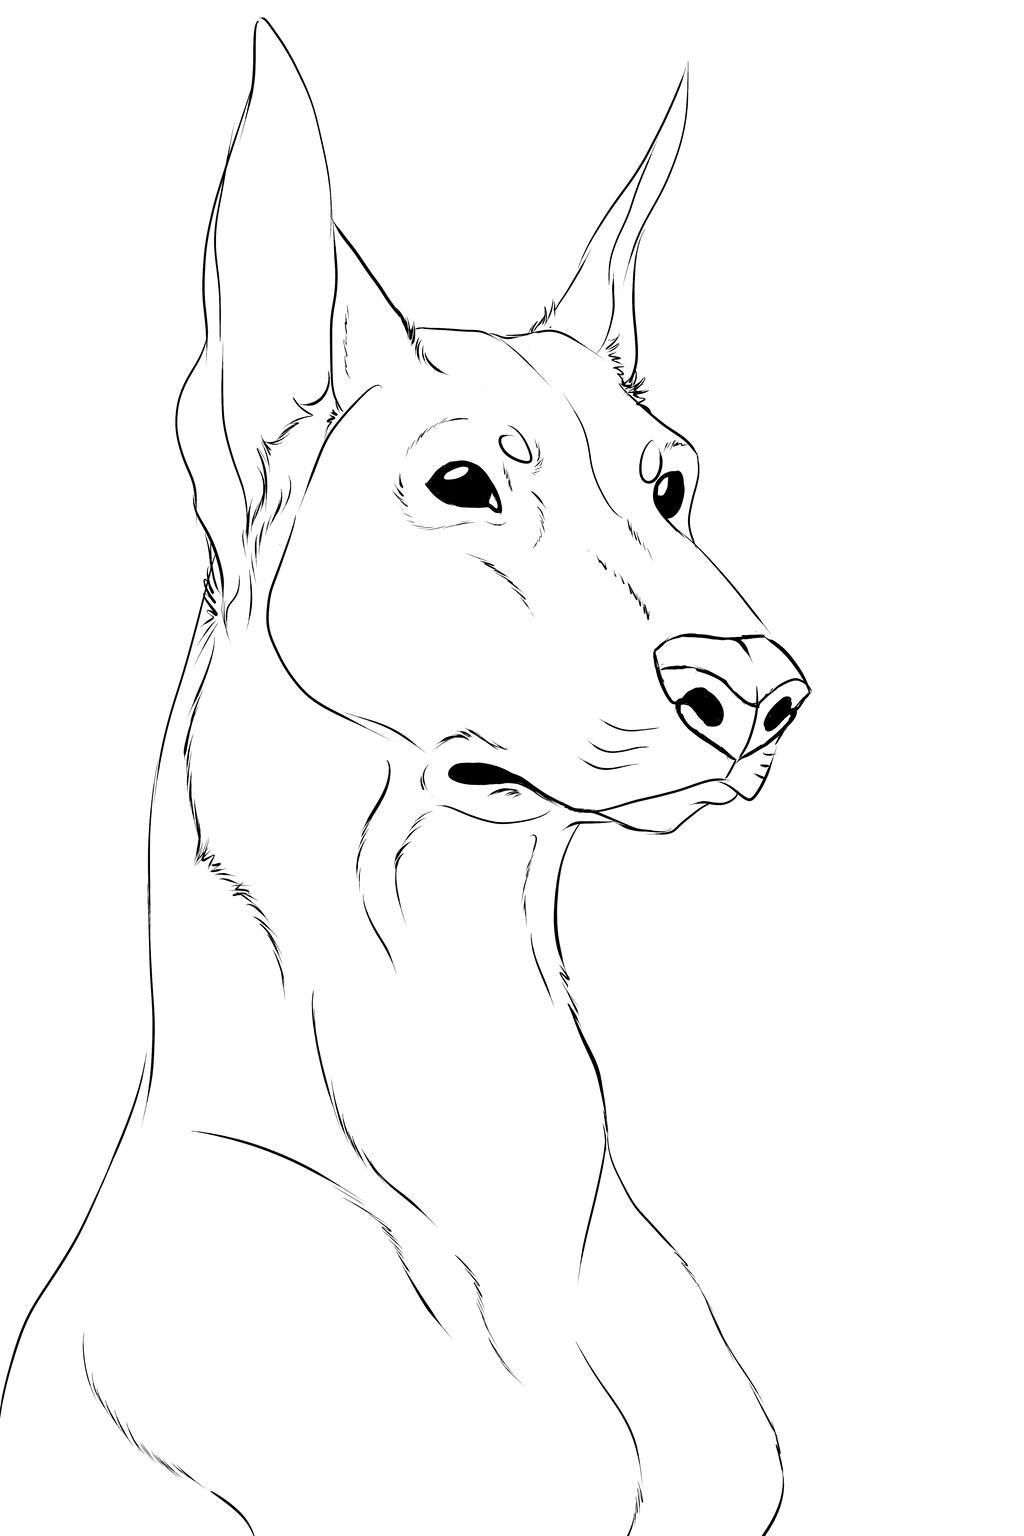 Line Art Png : Doberman lineart transparent bg by socialbutter on deviantart